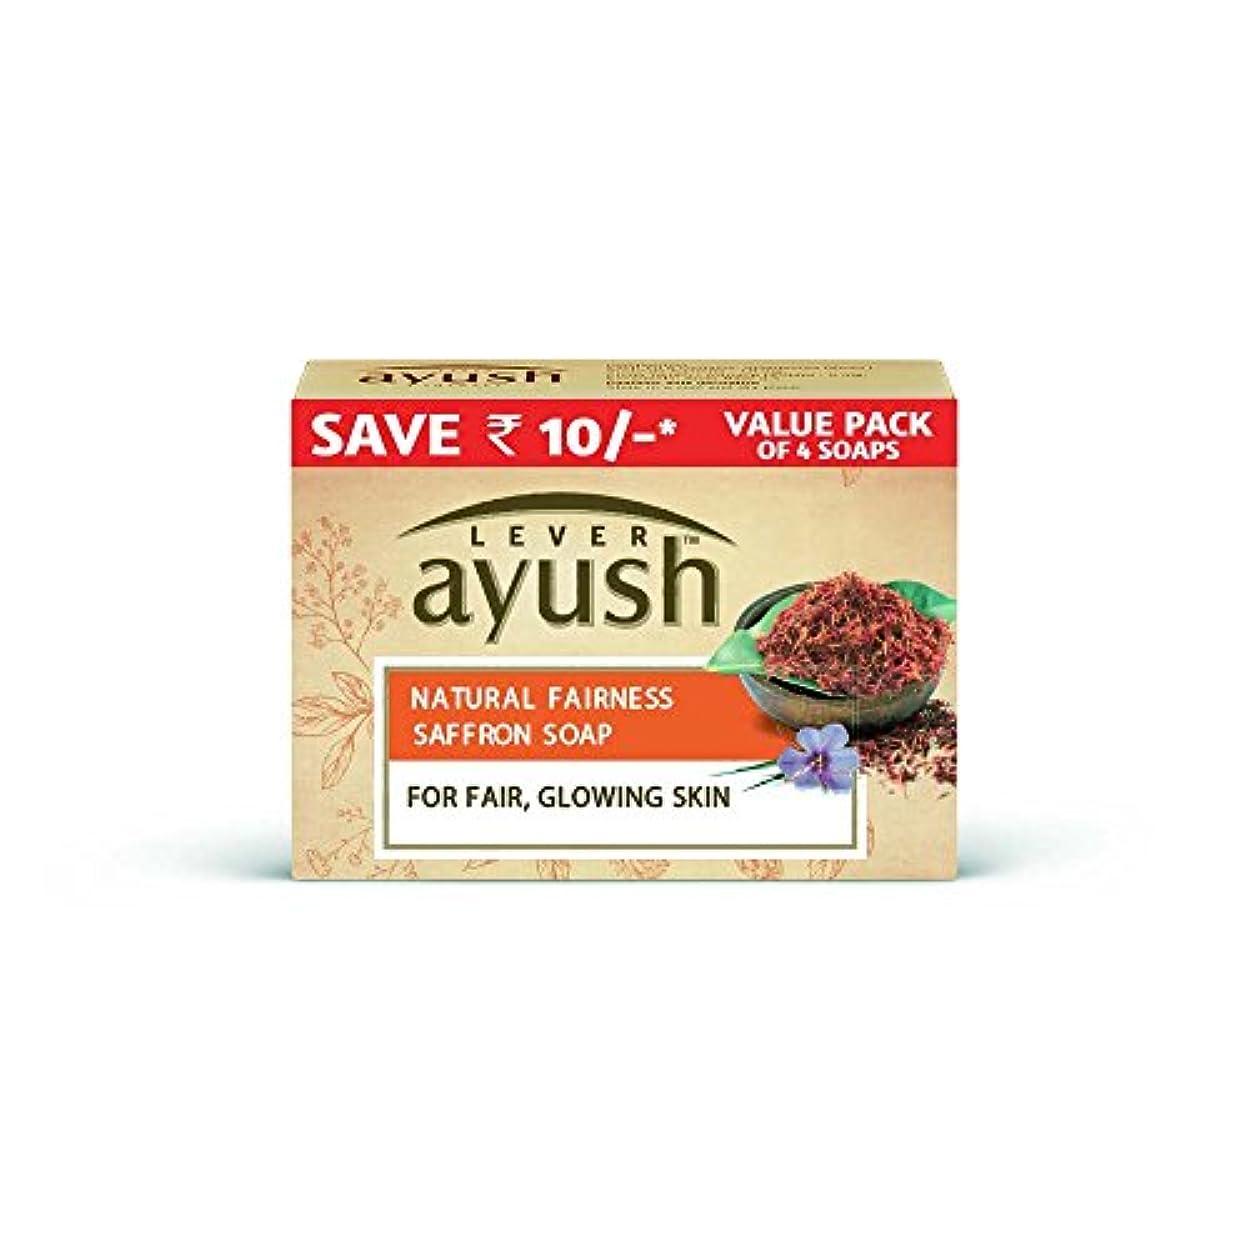 Lever Ayush Natural Fairness Saffron Soap, 100g (Pack of 4)